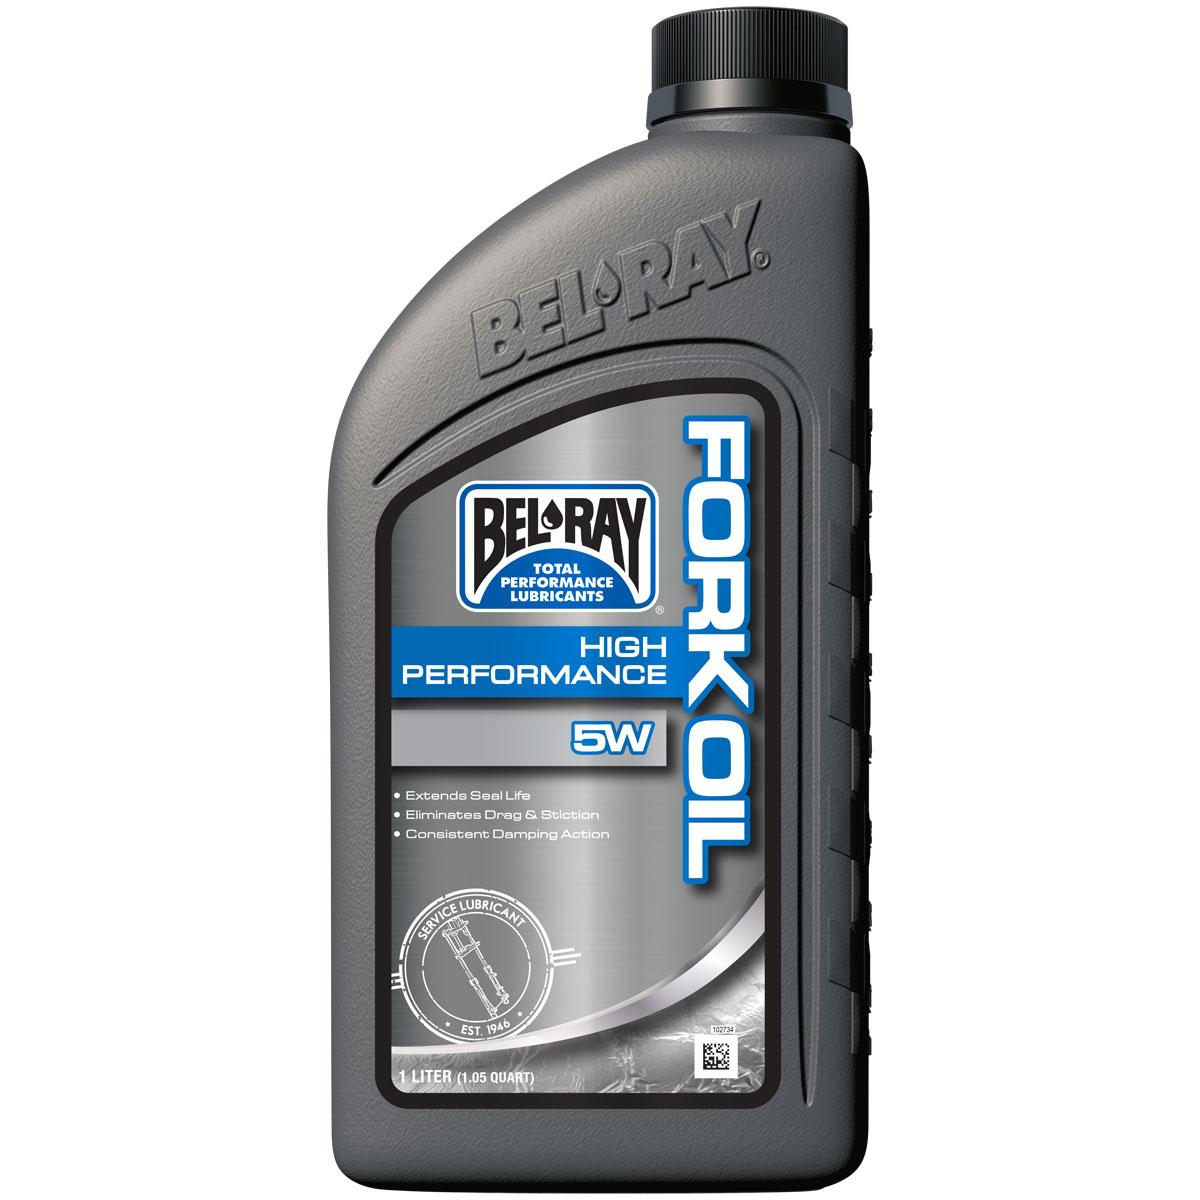 Bel-Ray 5W Fork Oil Liter